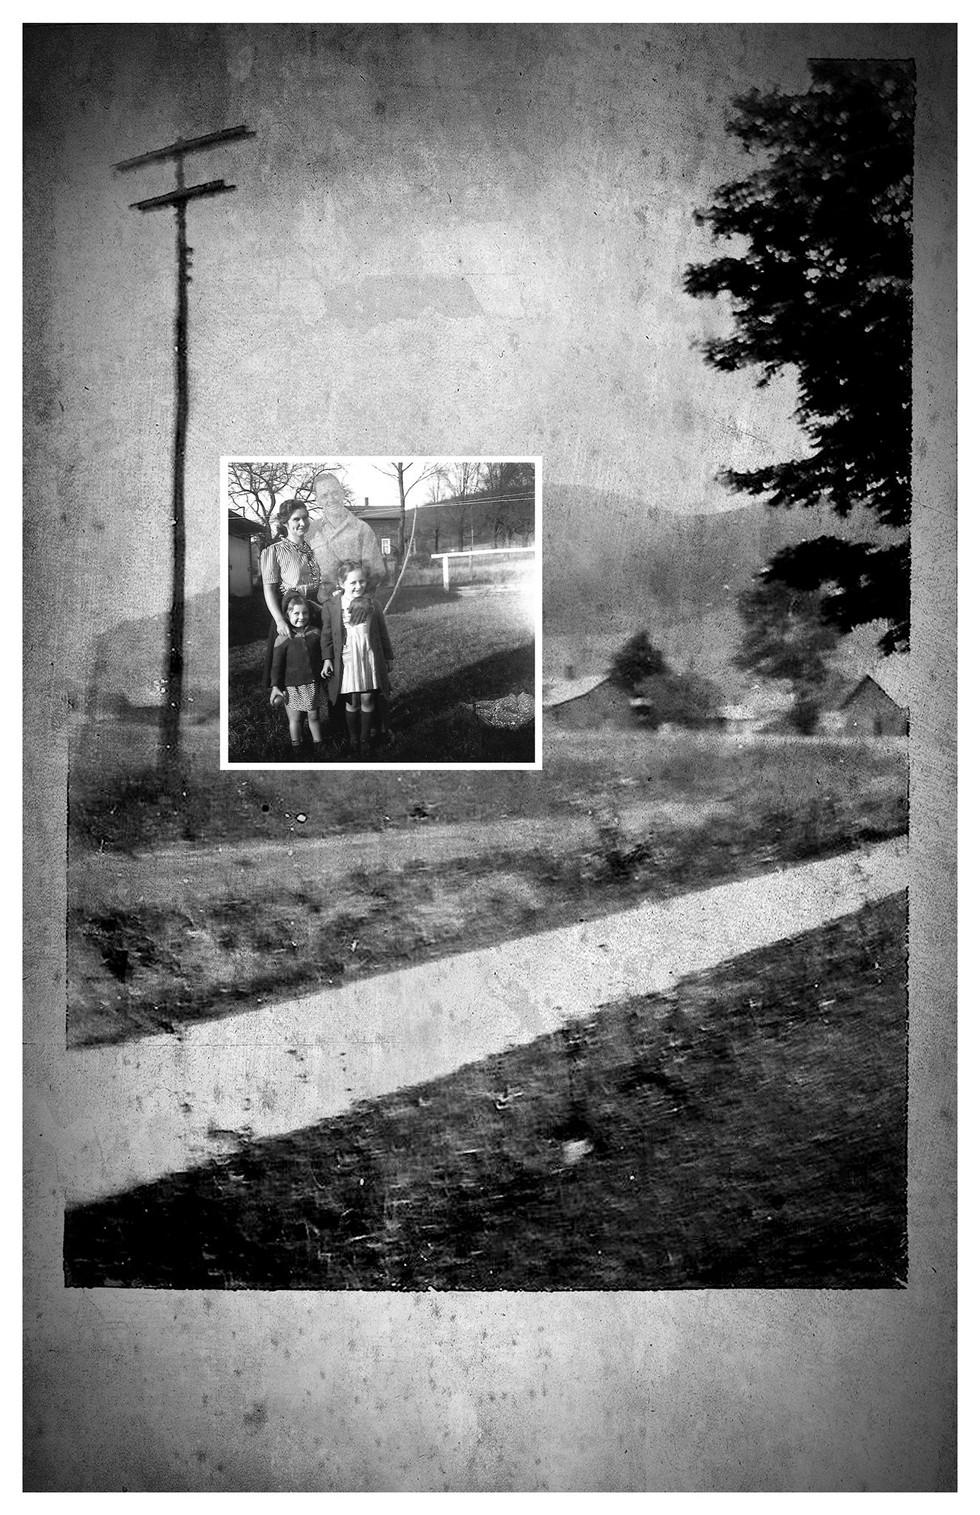 Road Less Traveled/Emmanuel Fried New Play Workshop